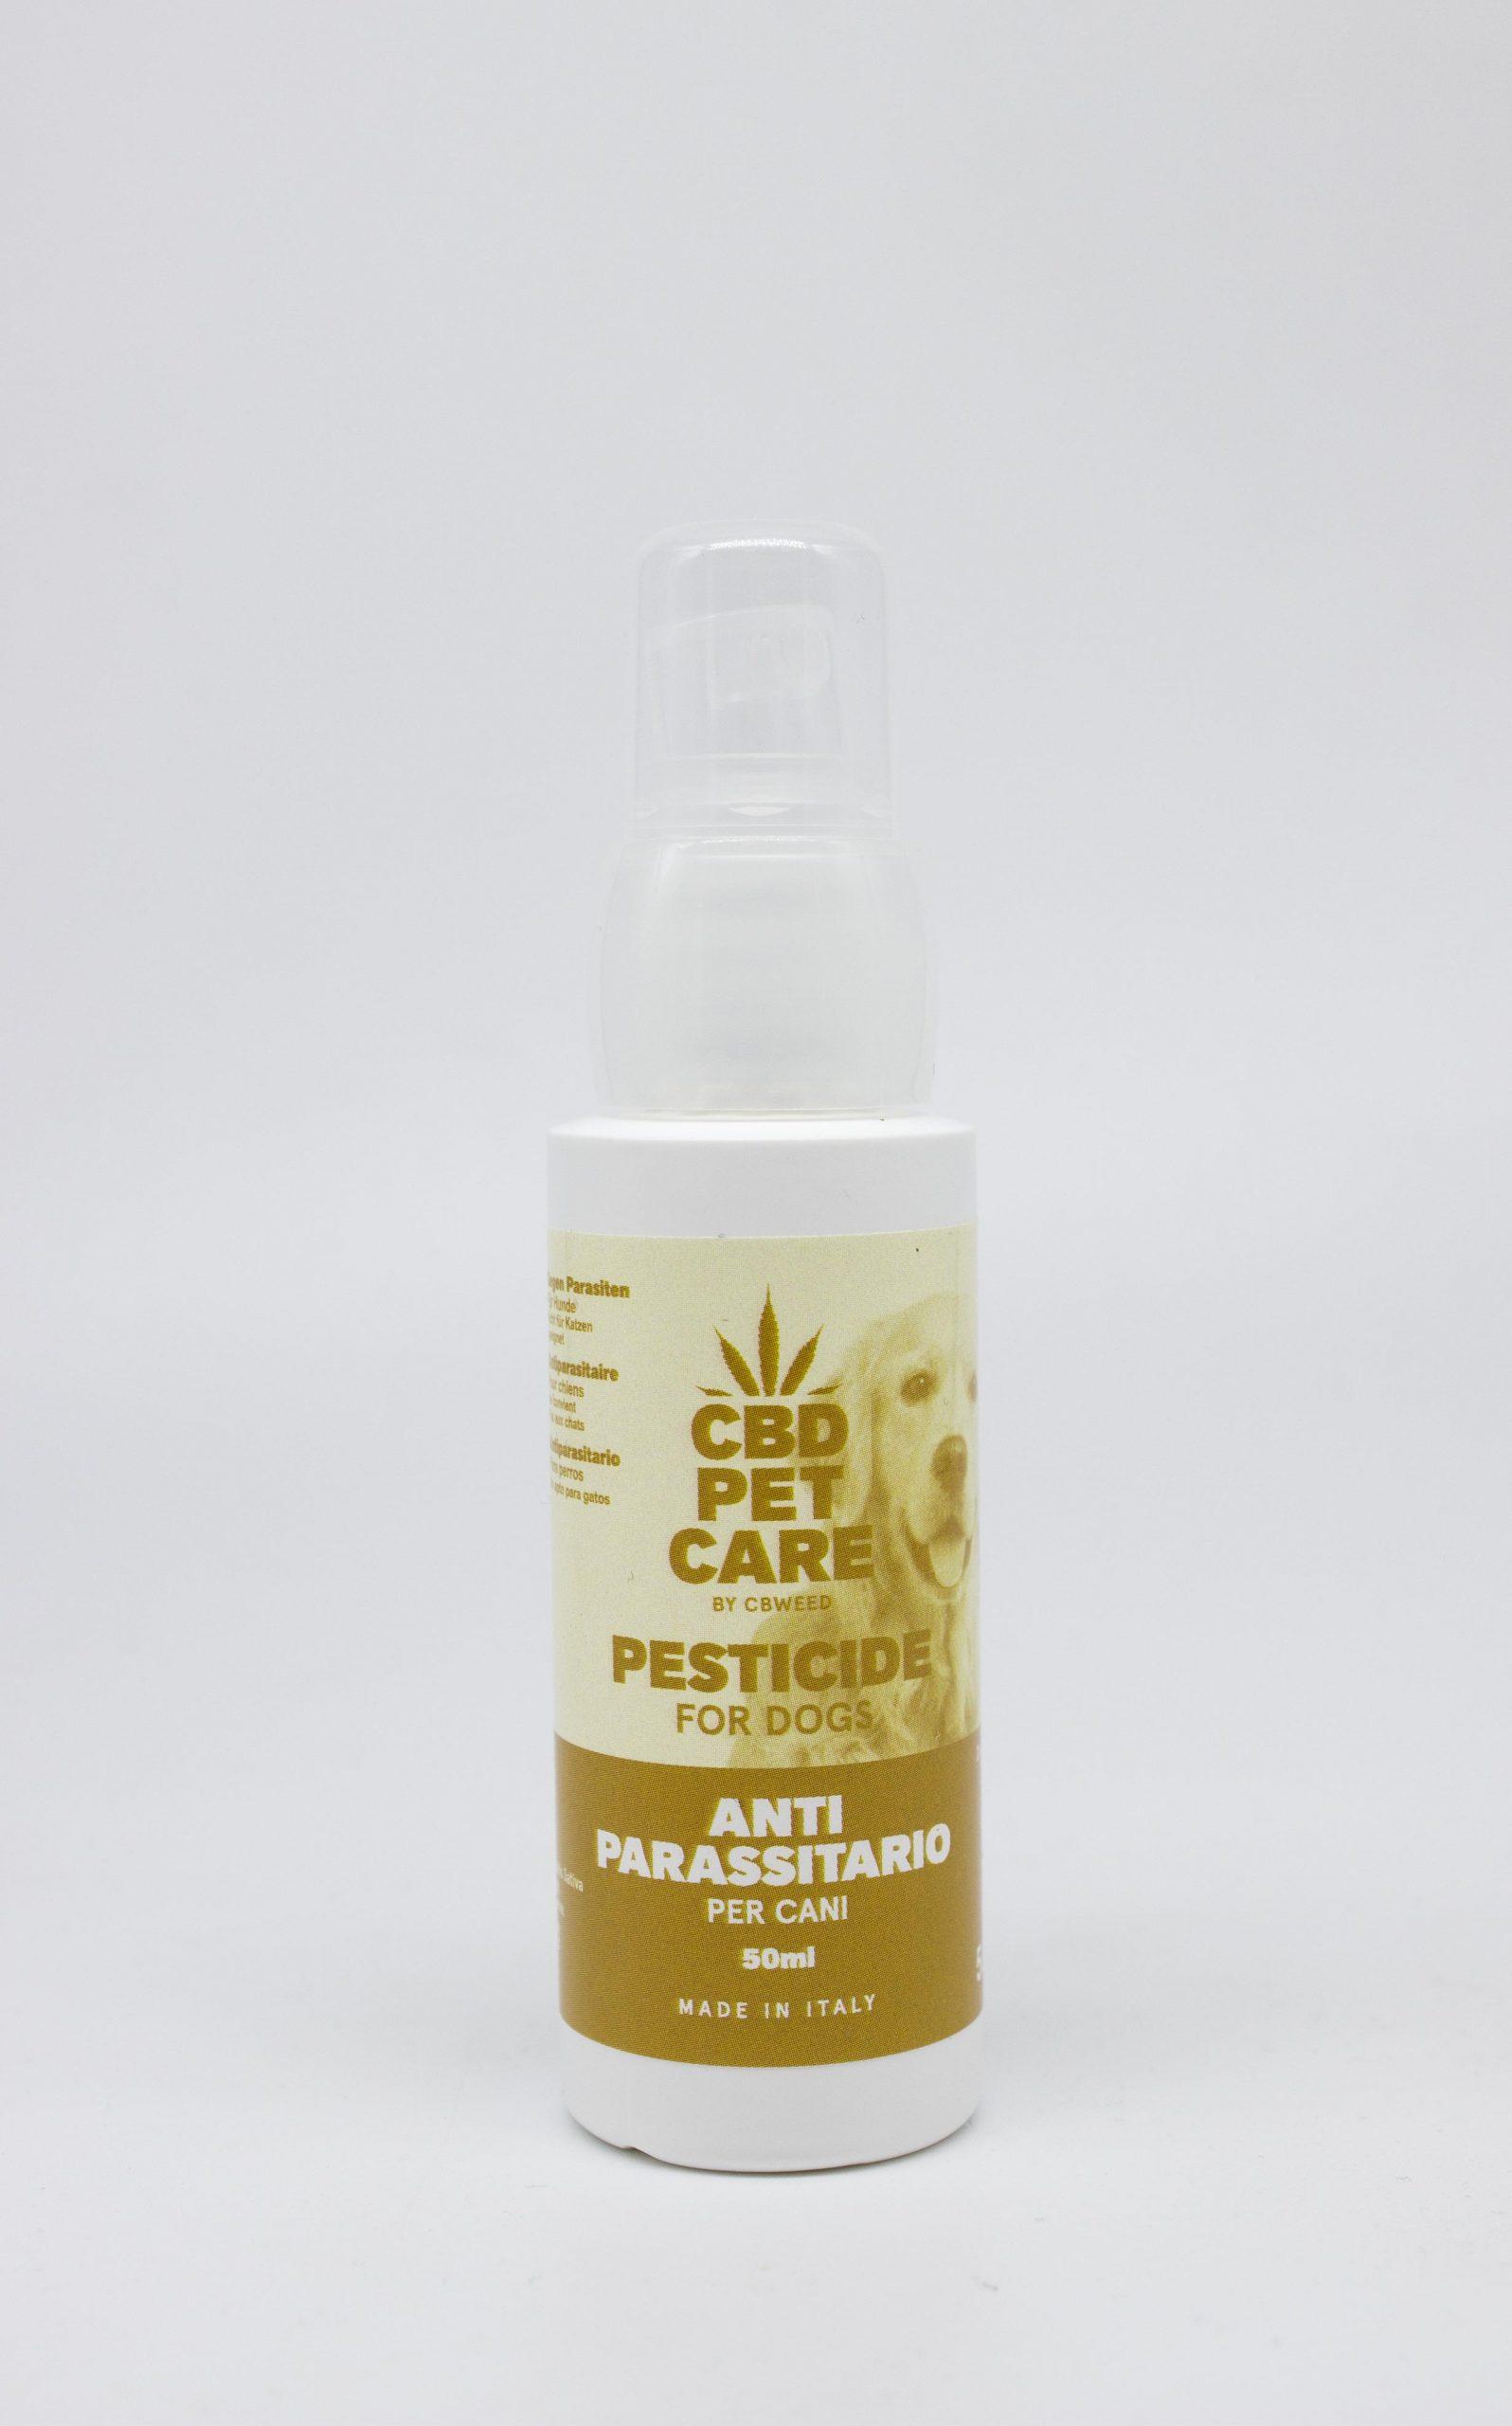 Pesticida Cani scaled - Antiparassitario Spray per Cani - 50ml